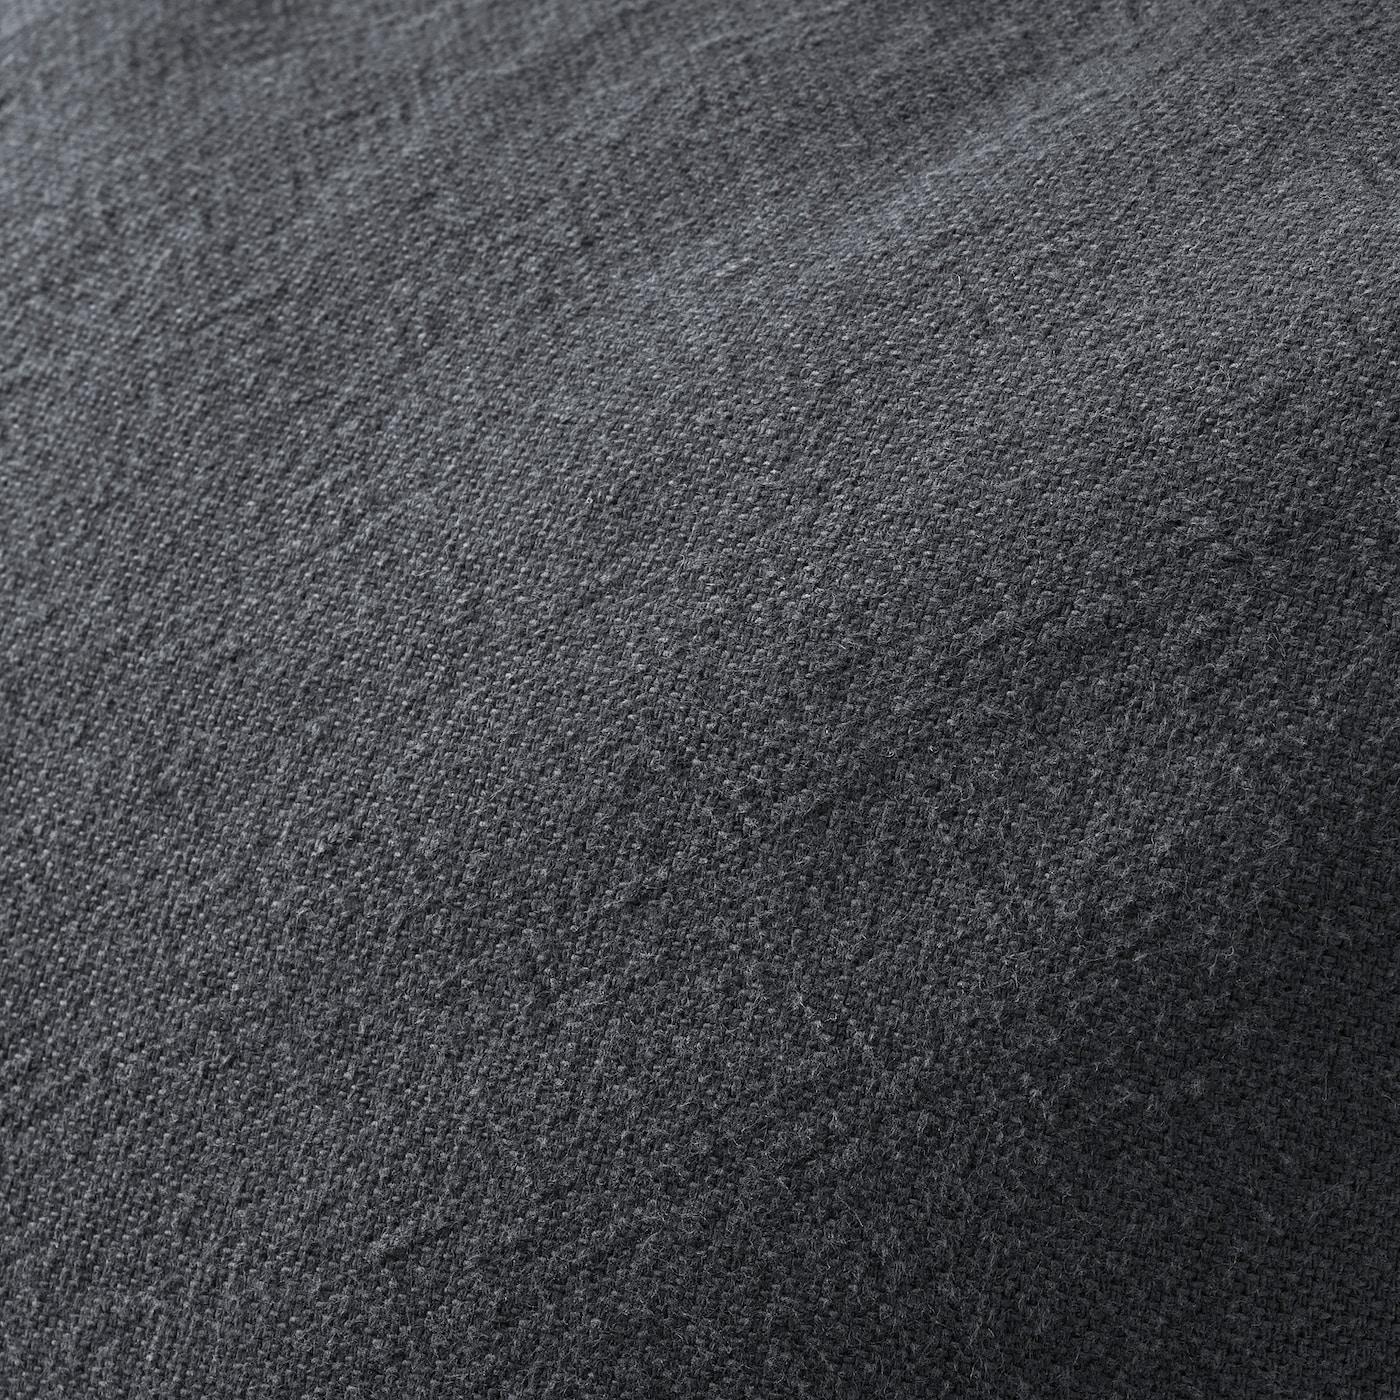 JOFRID Kissenbezug dunkel blaugrau 65 cm 65 cm